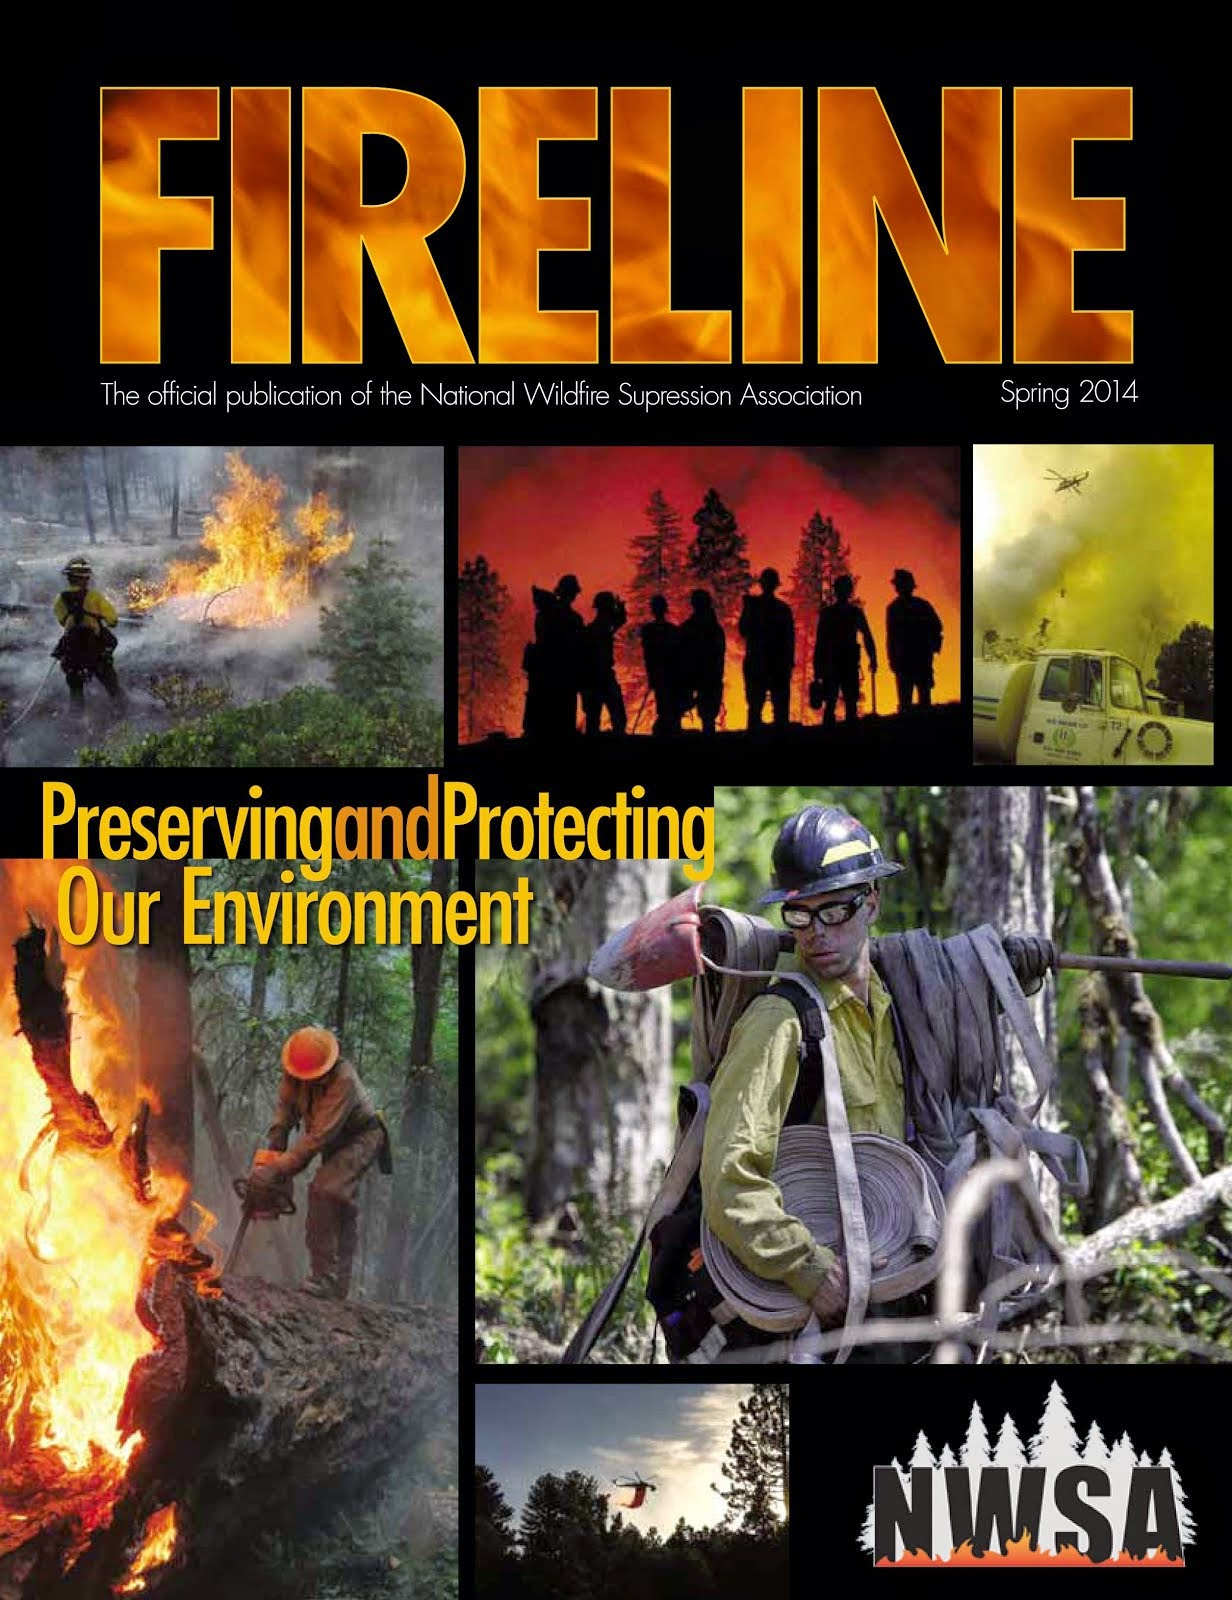 Fireline Magazine